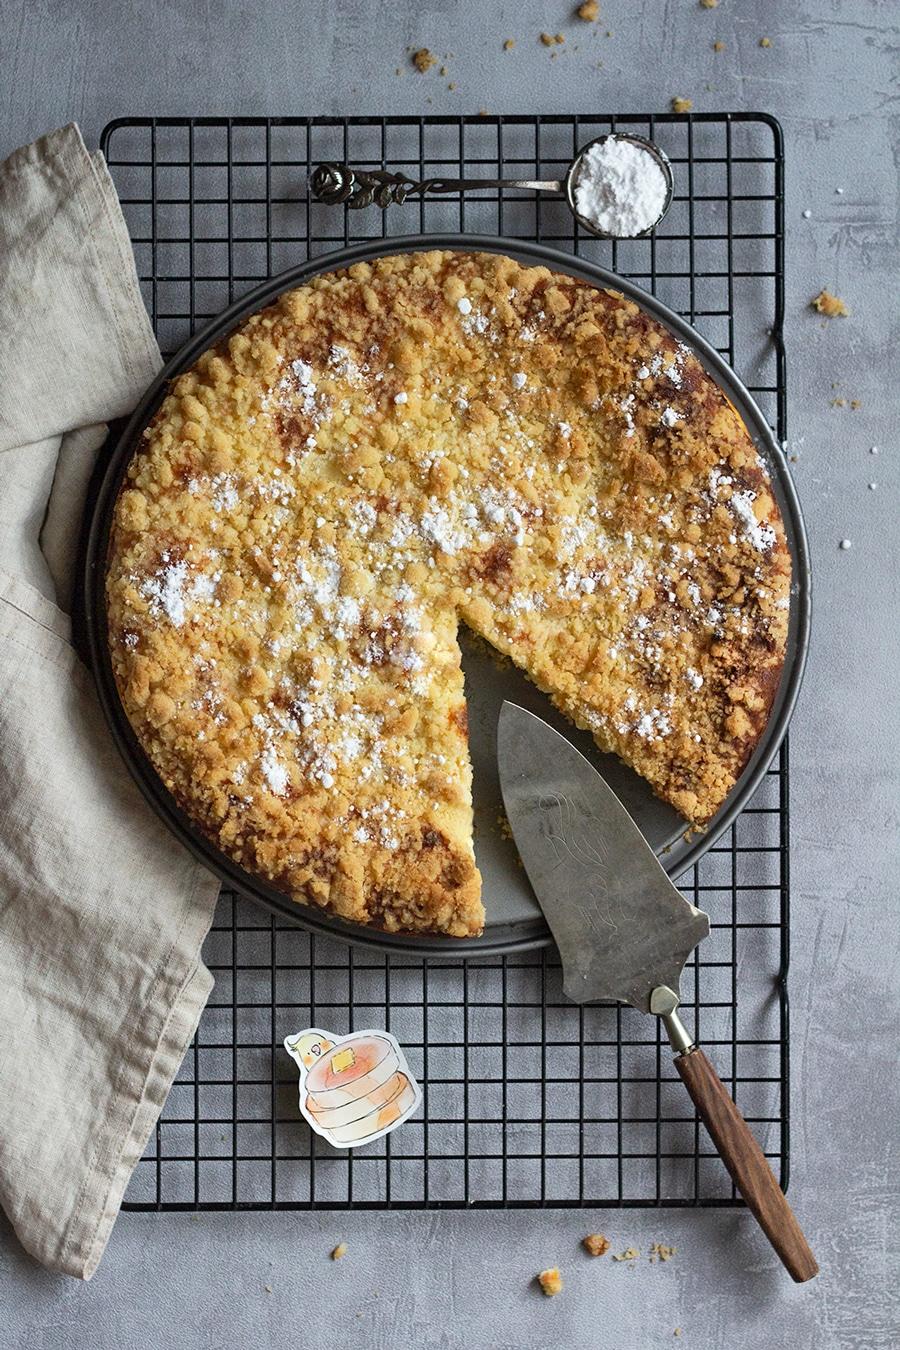 Apfel-Käse-Streusel-Kuchen